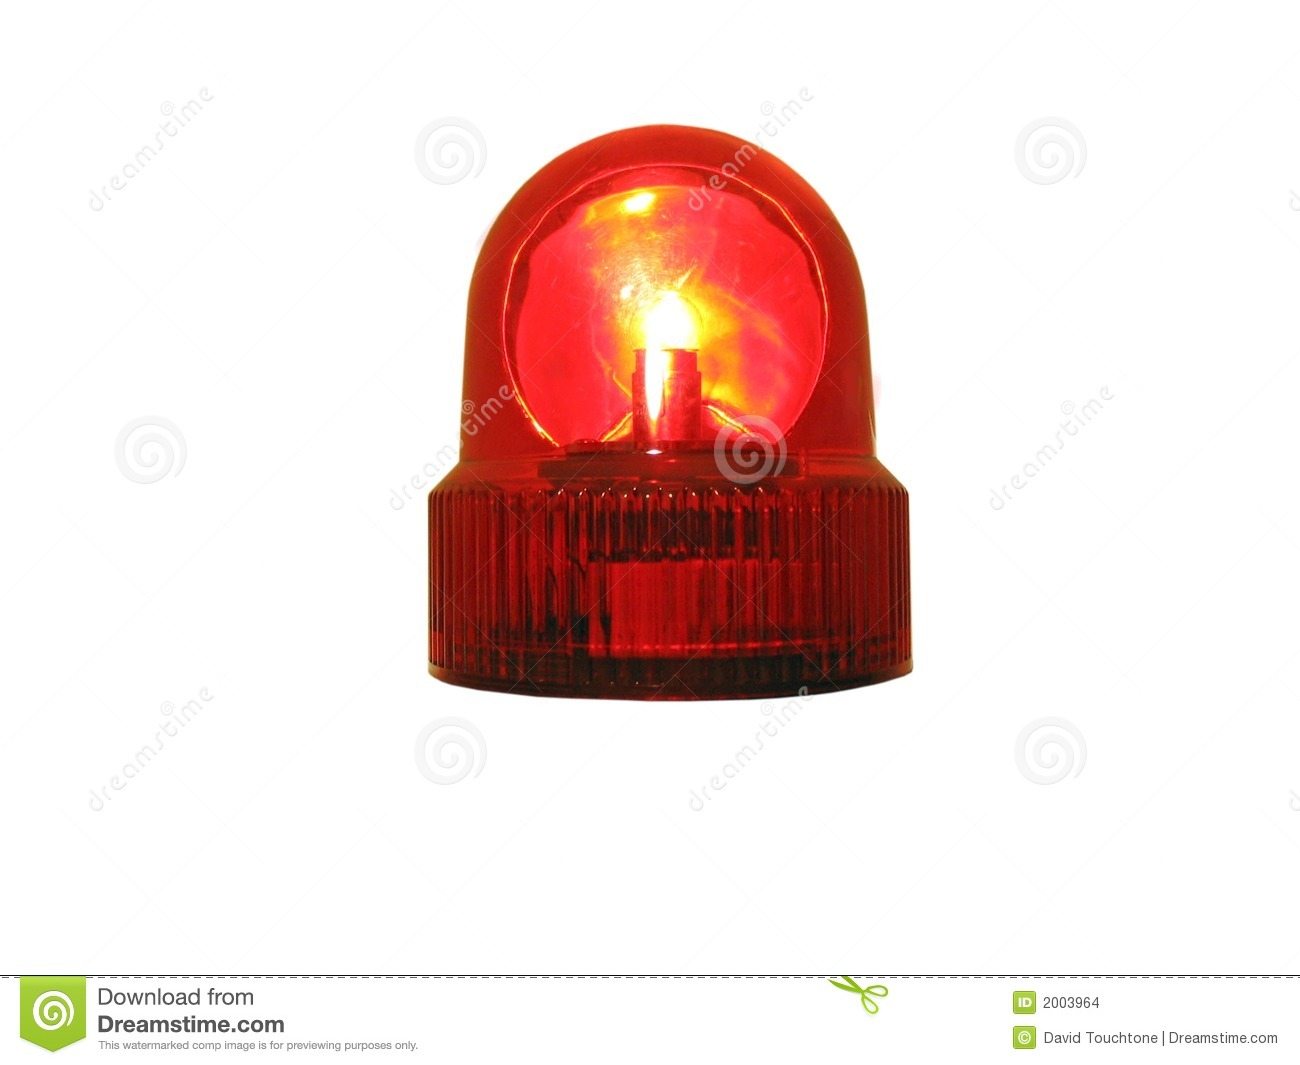 Flashing light clipart - Clipground for Warning Light Clipart  575lpg